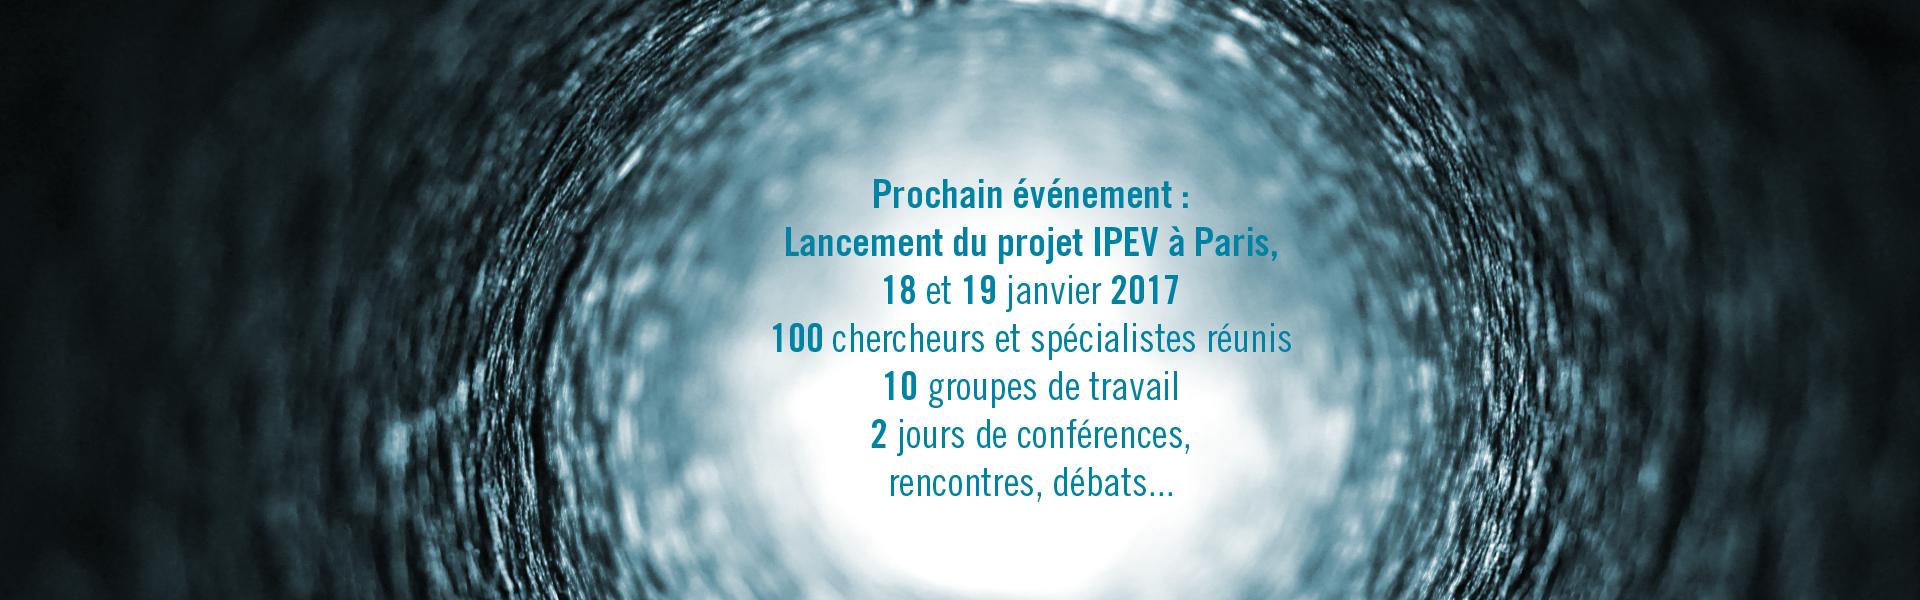 francaisplan-de-travail-11